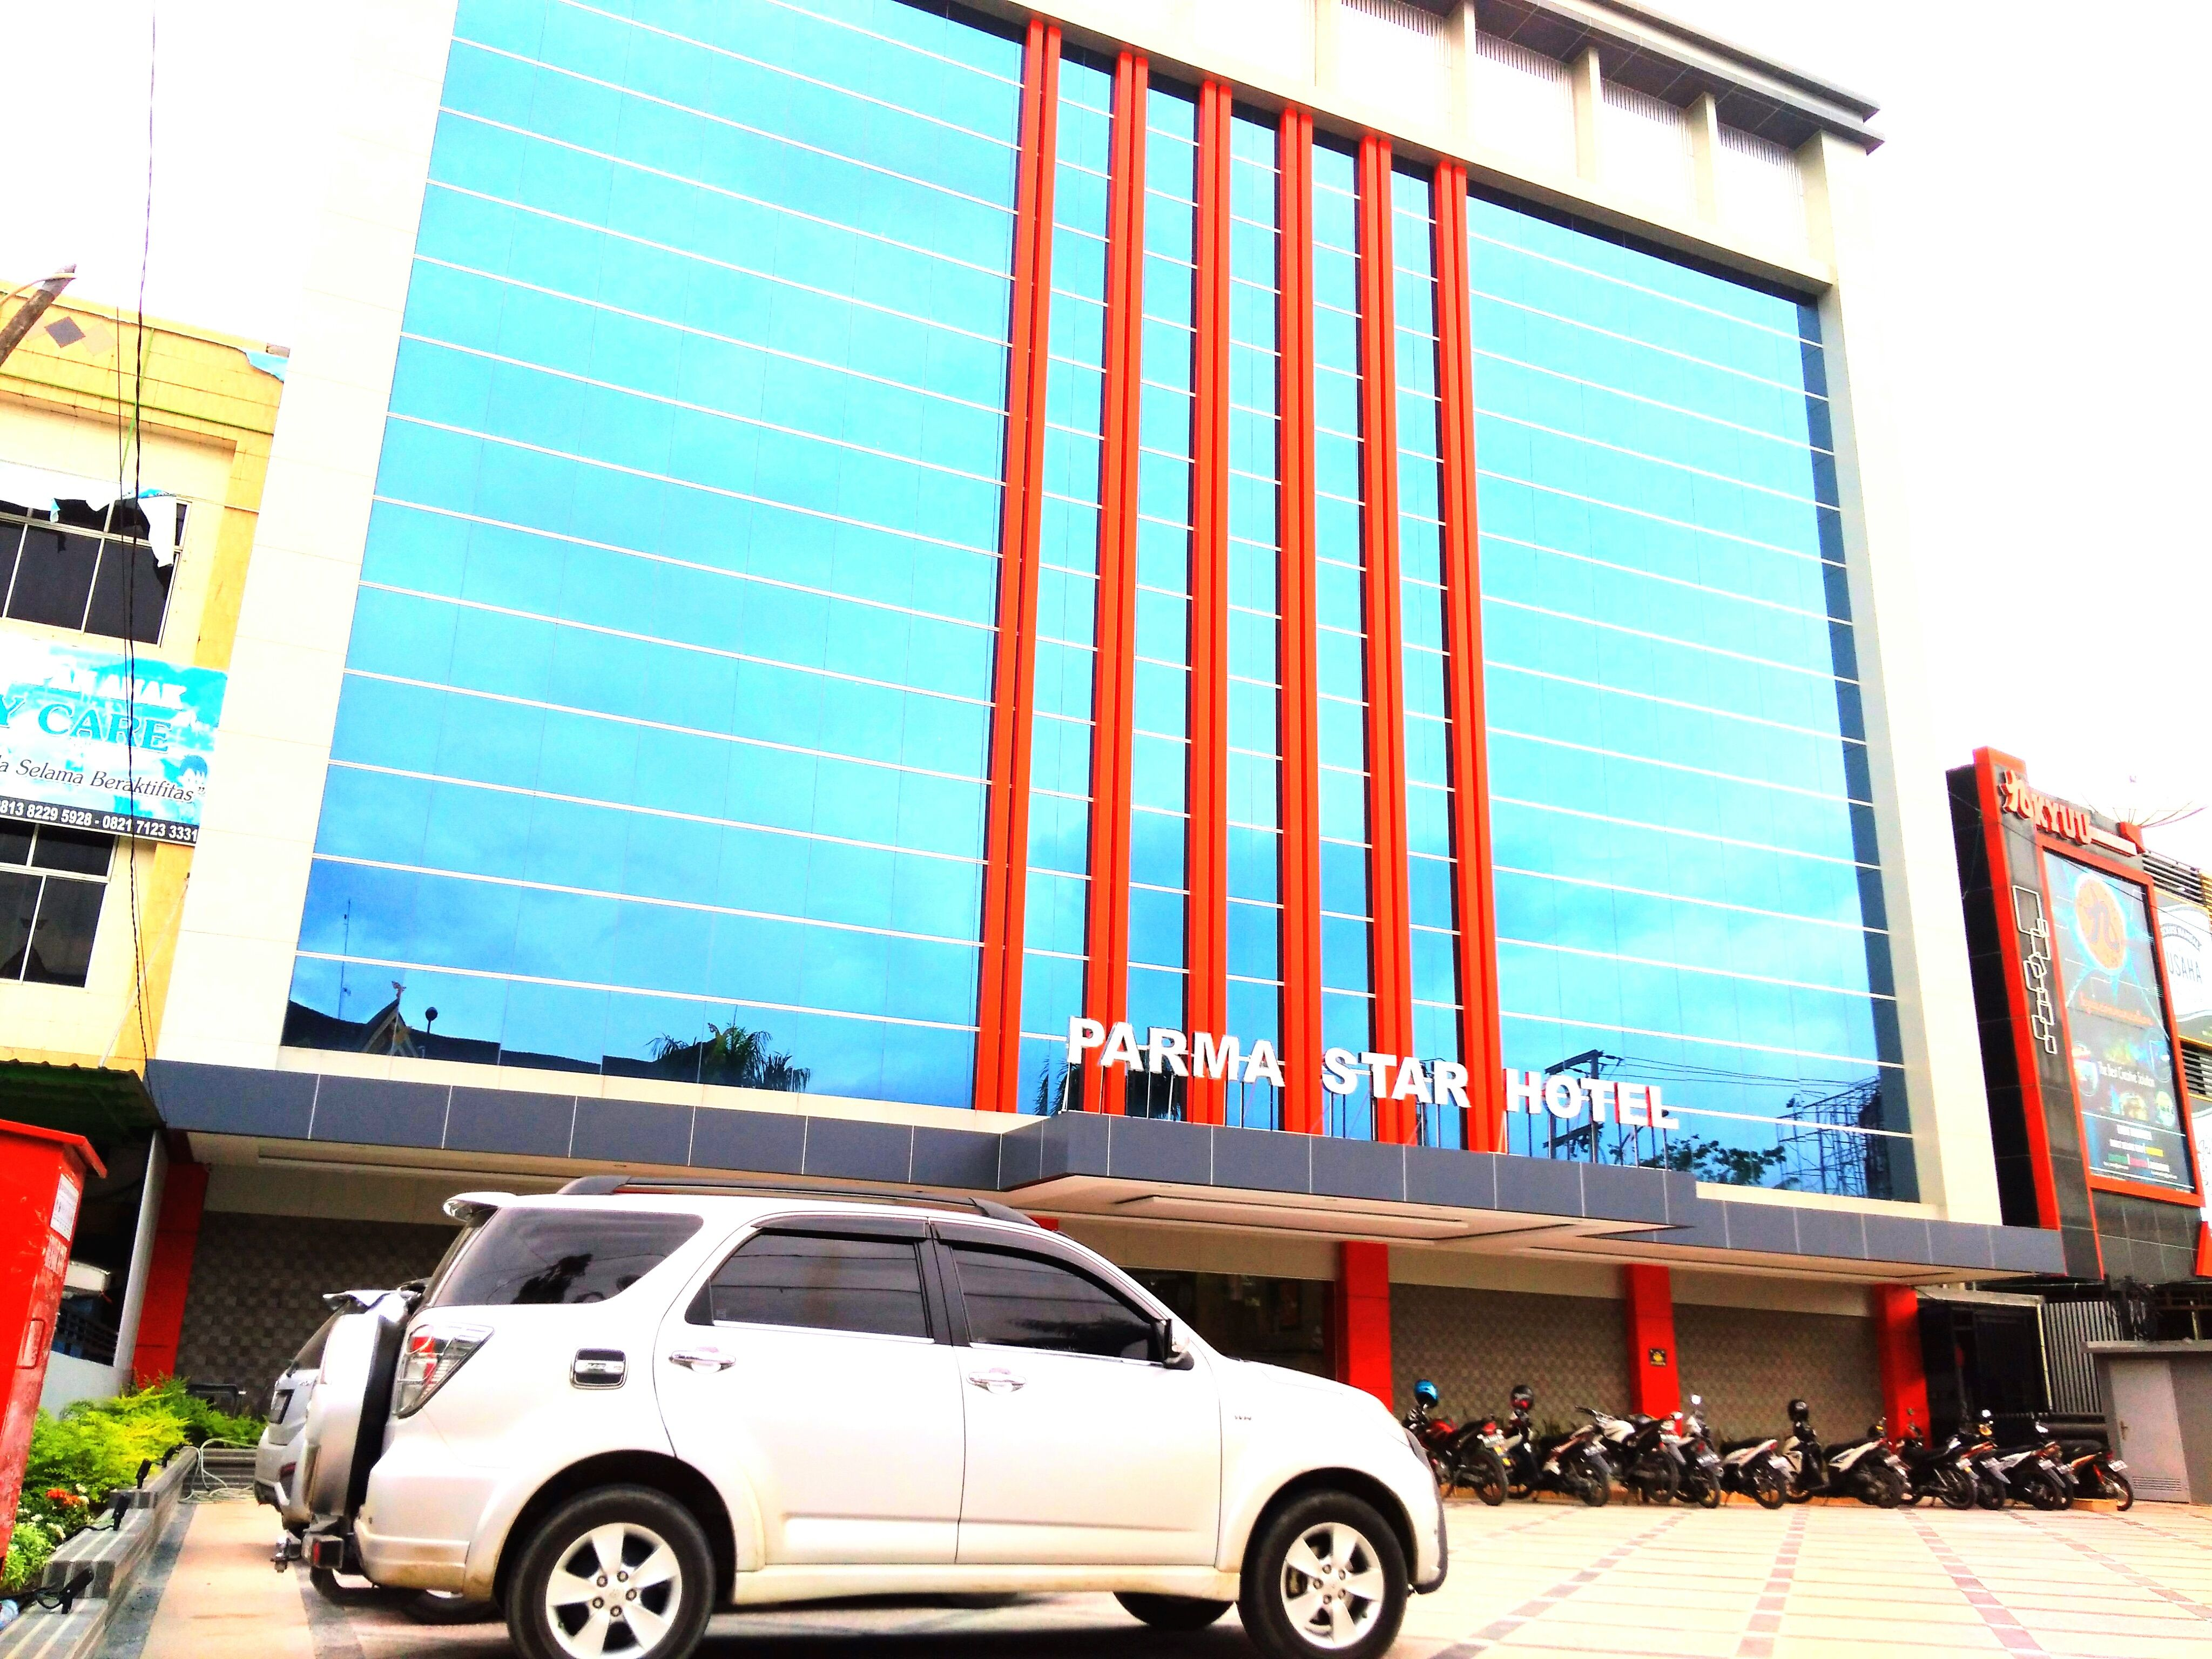 Parma Star Hotel, Pekanbaru